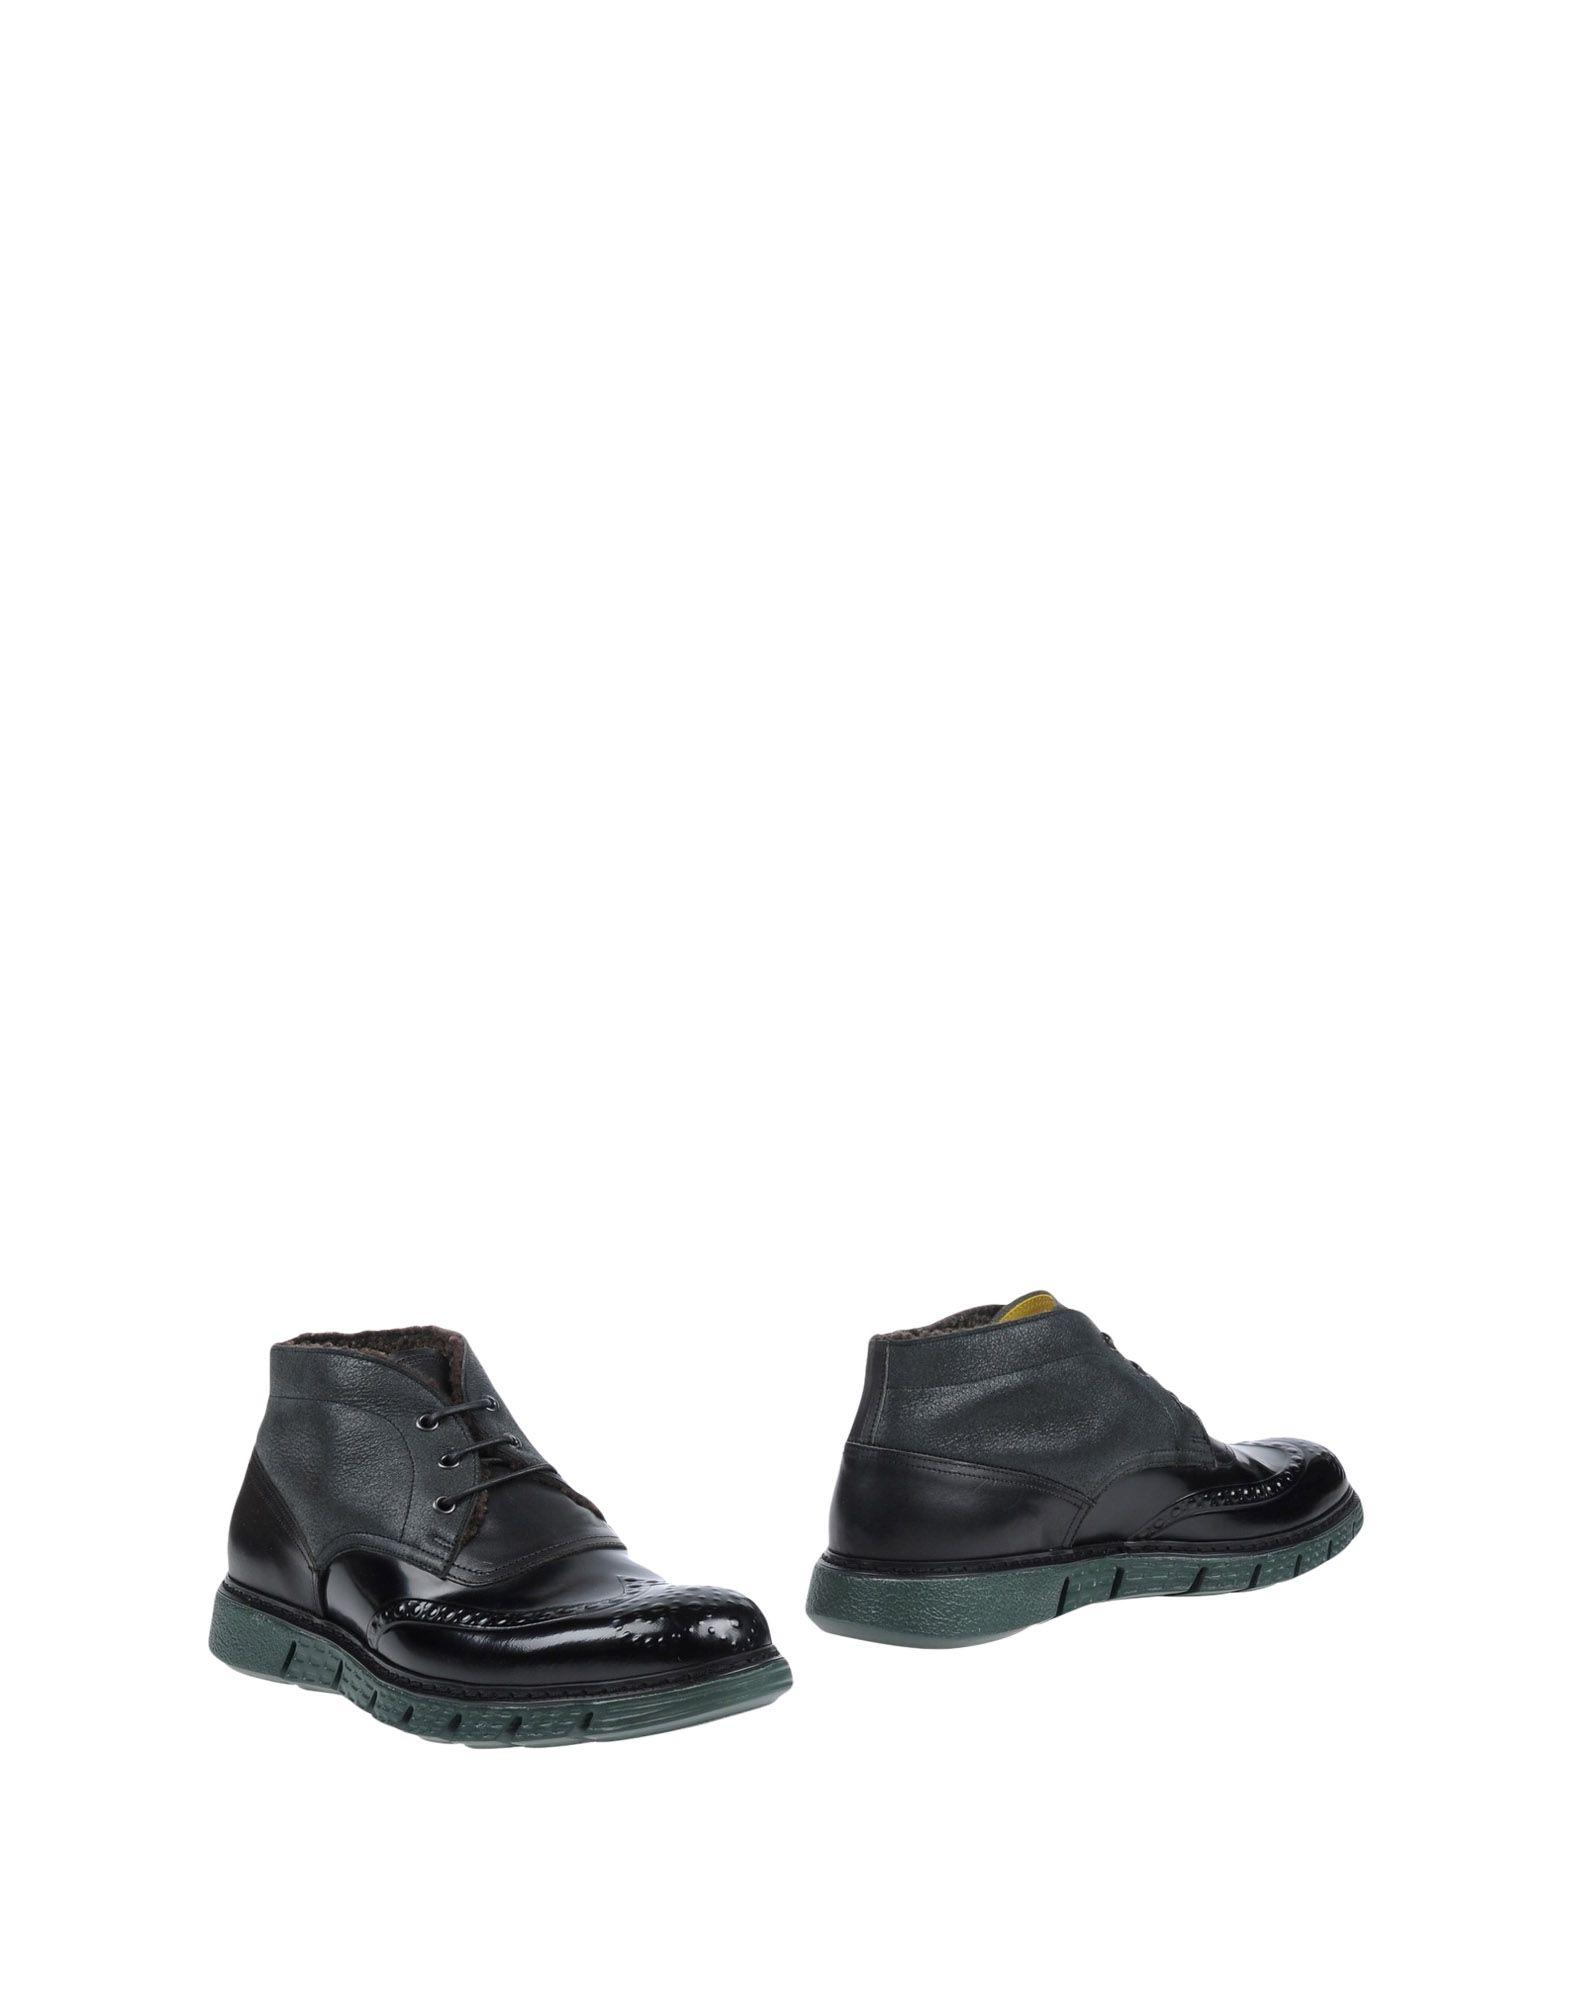 BARRACUDA Полусапоги и высокие ботинки barracuda полусапоги и высокие ботинки